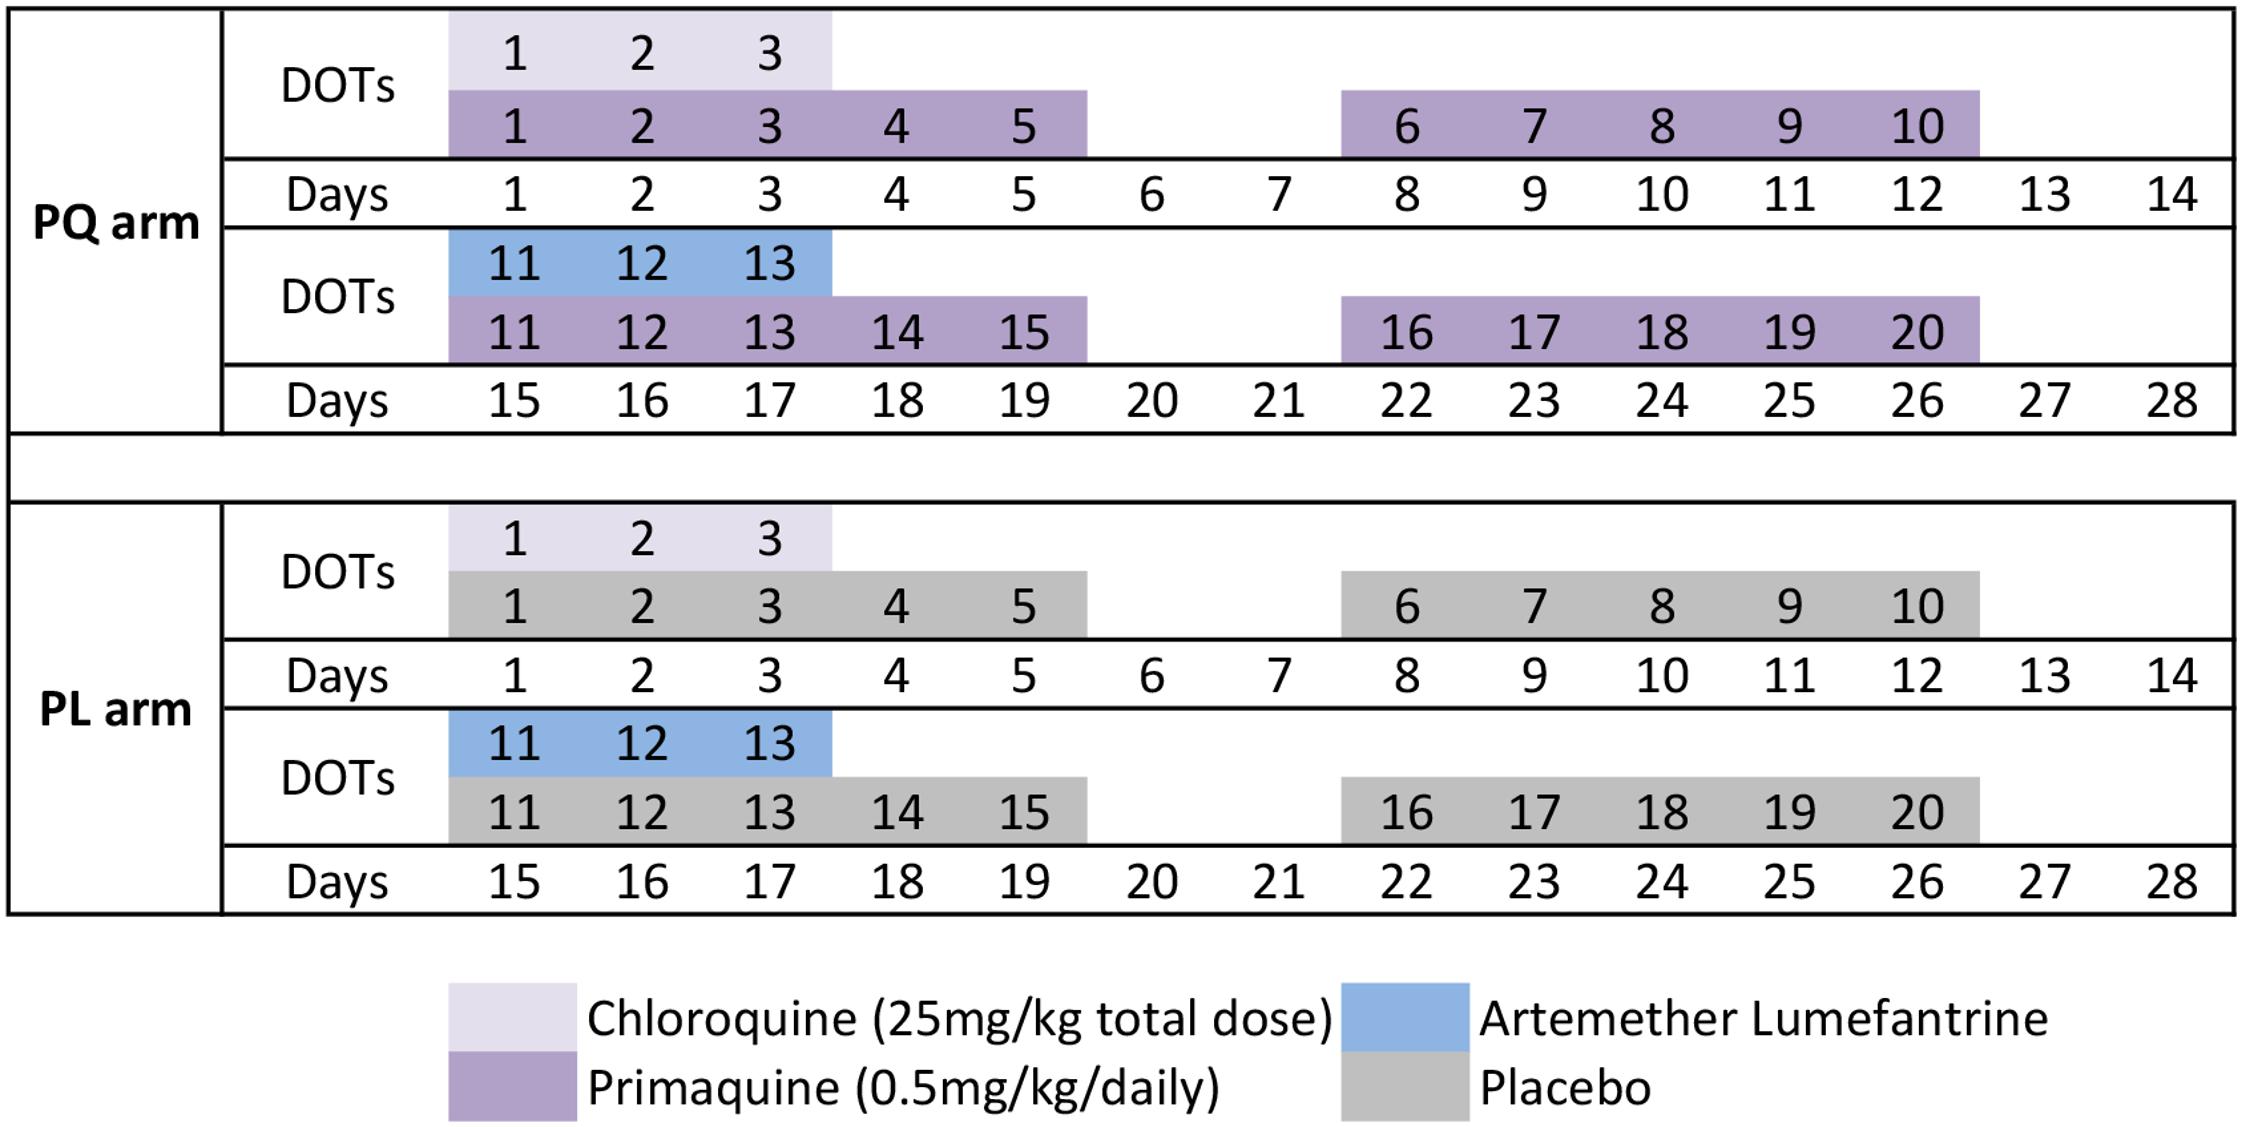 Drug administration schedule.